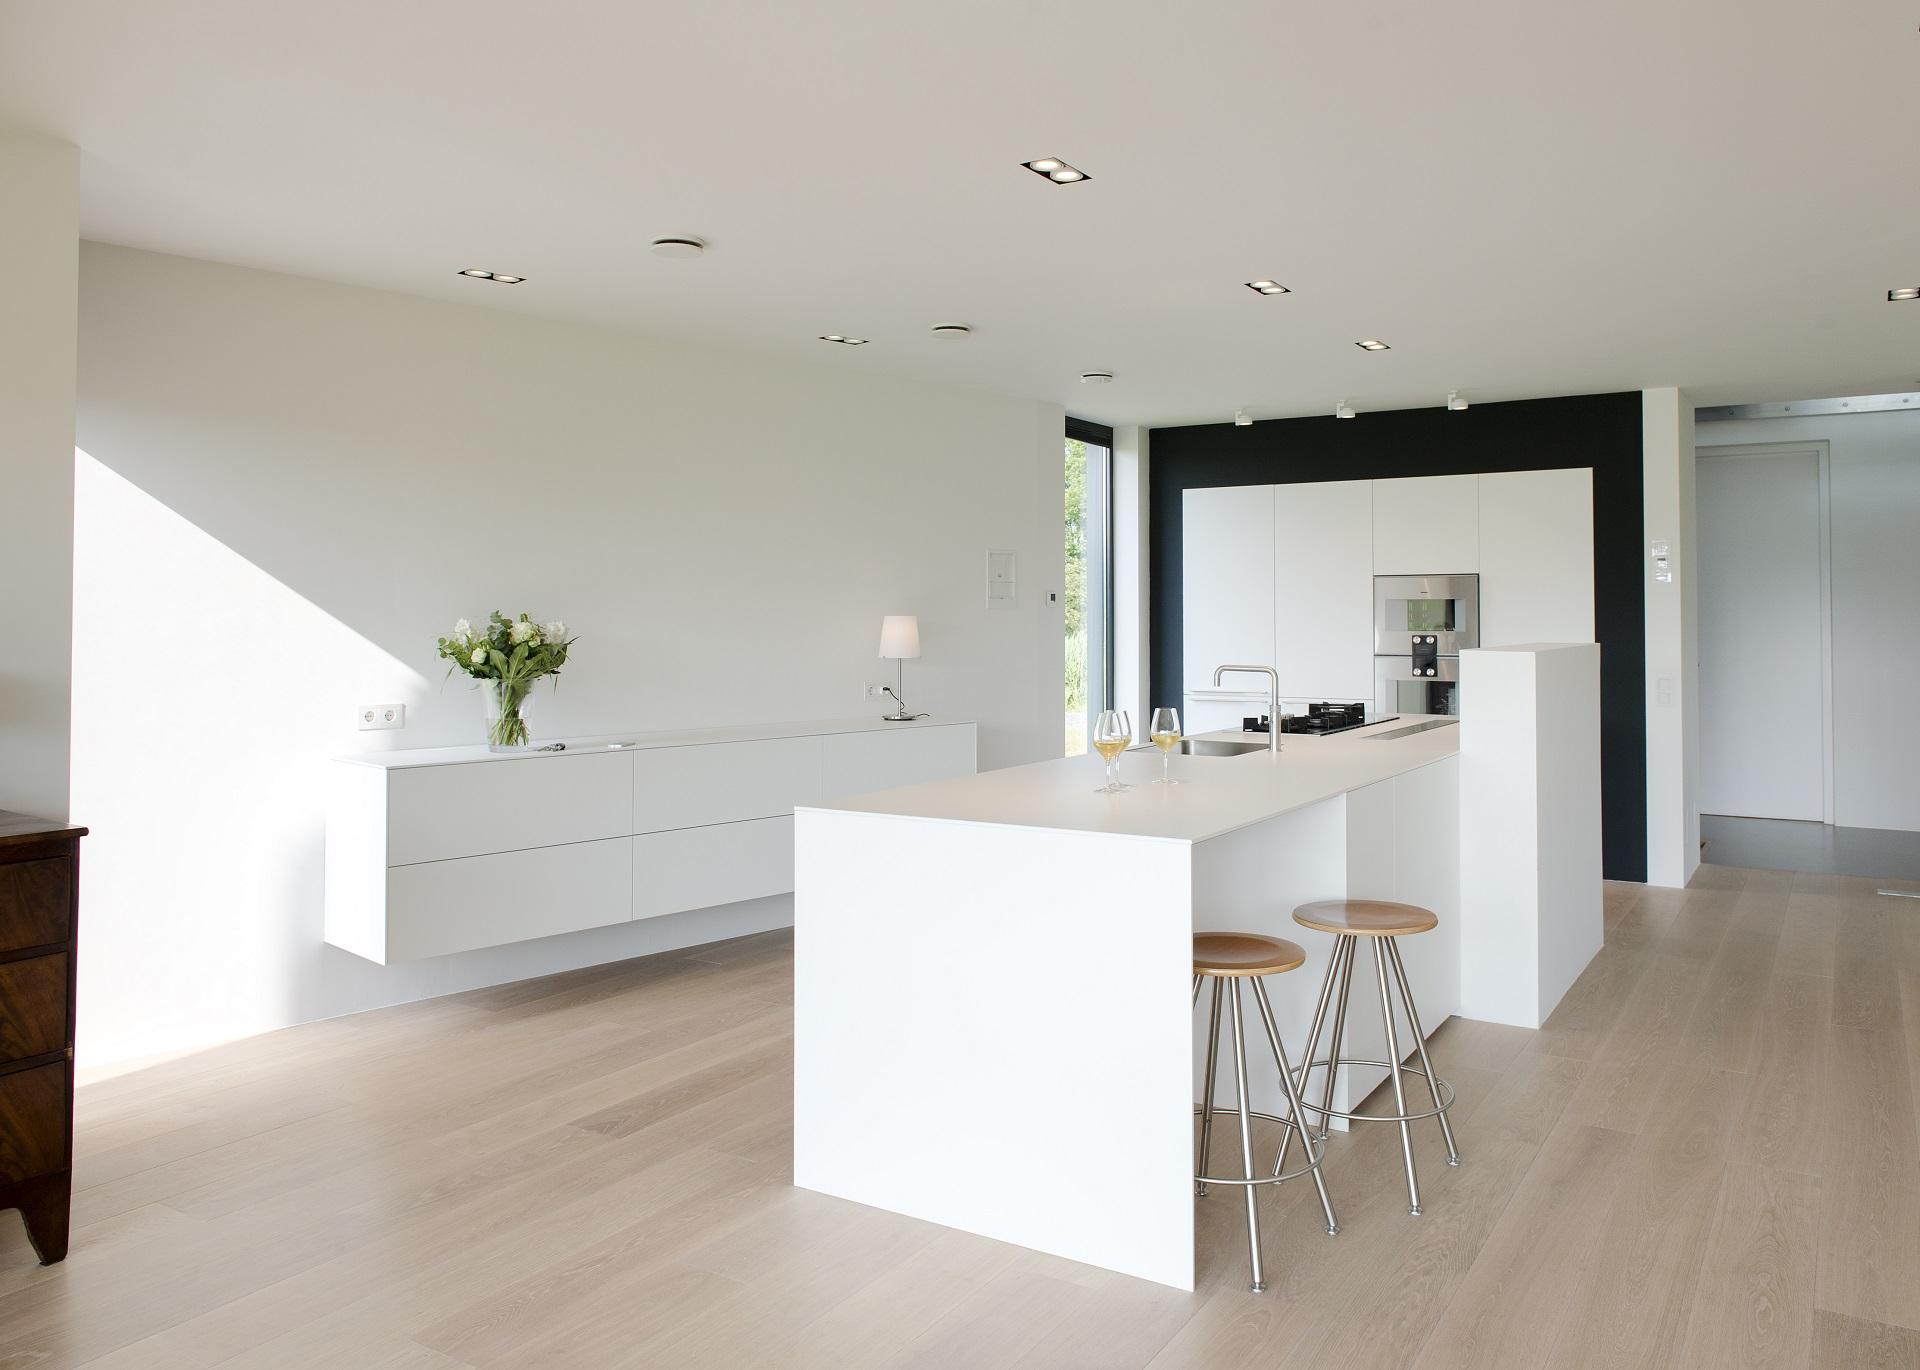 Bulthaup B3 Keuken : Bulthaup uw keuken